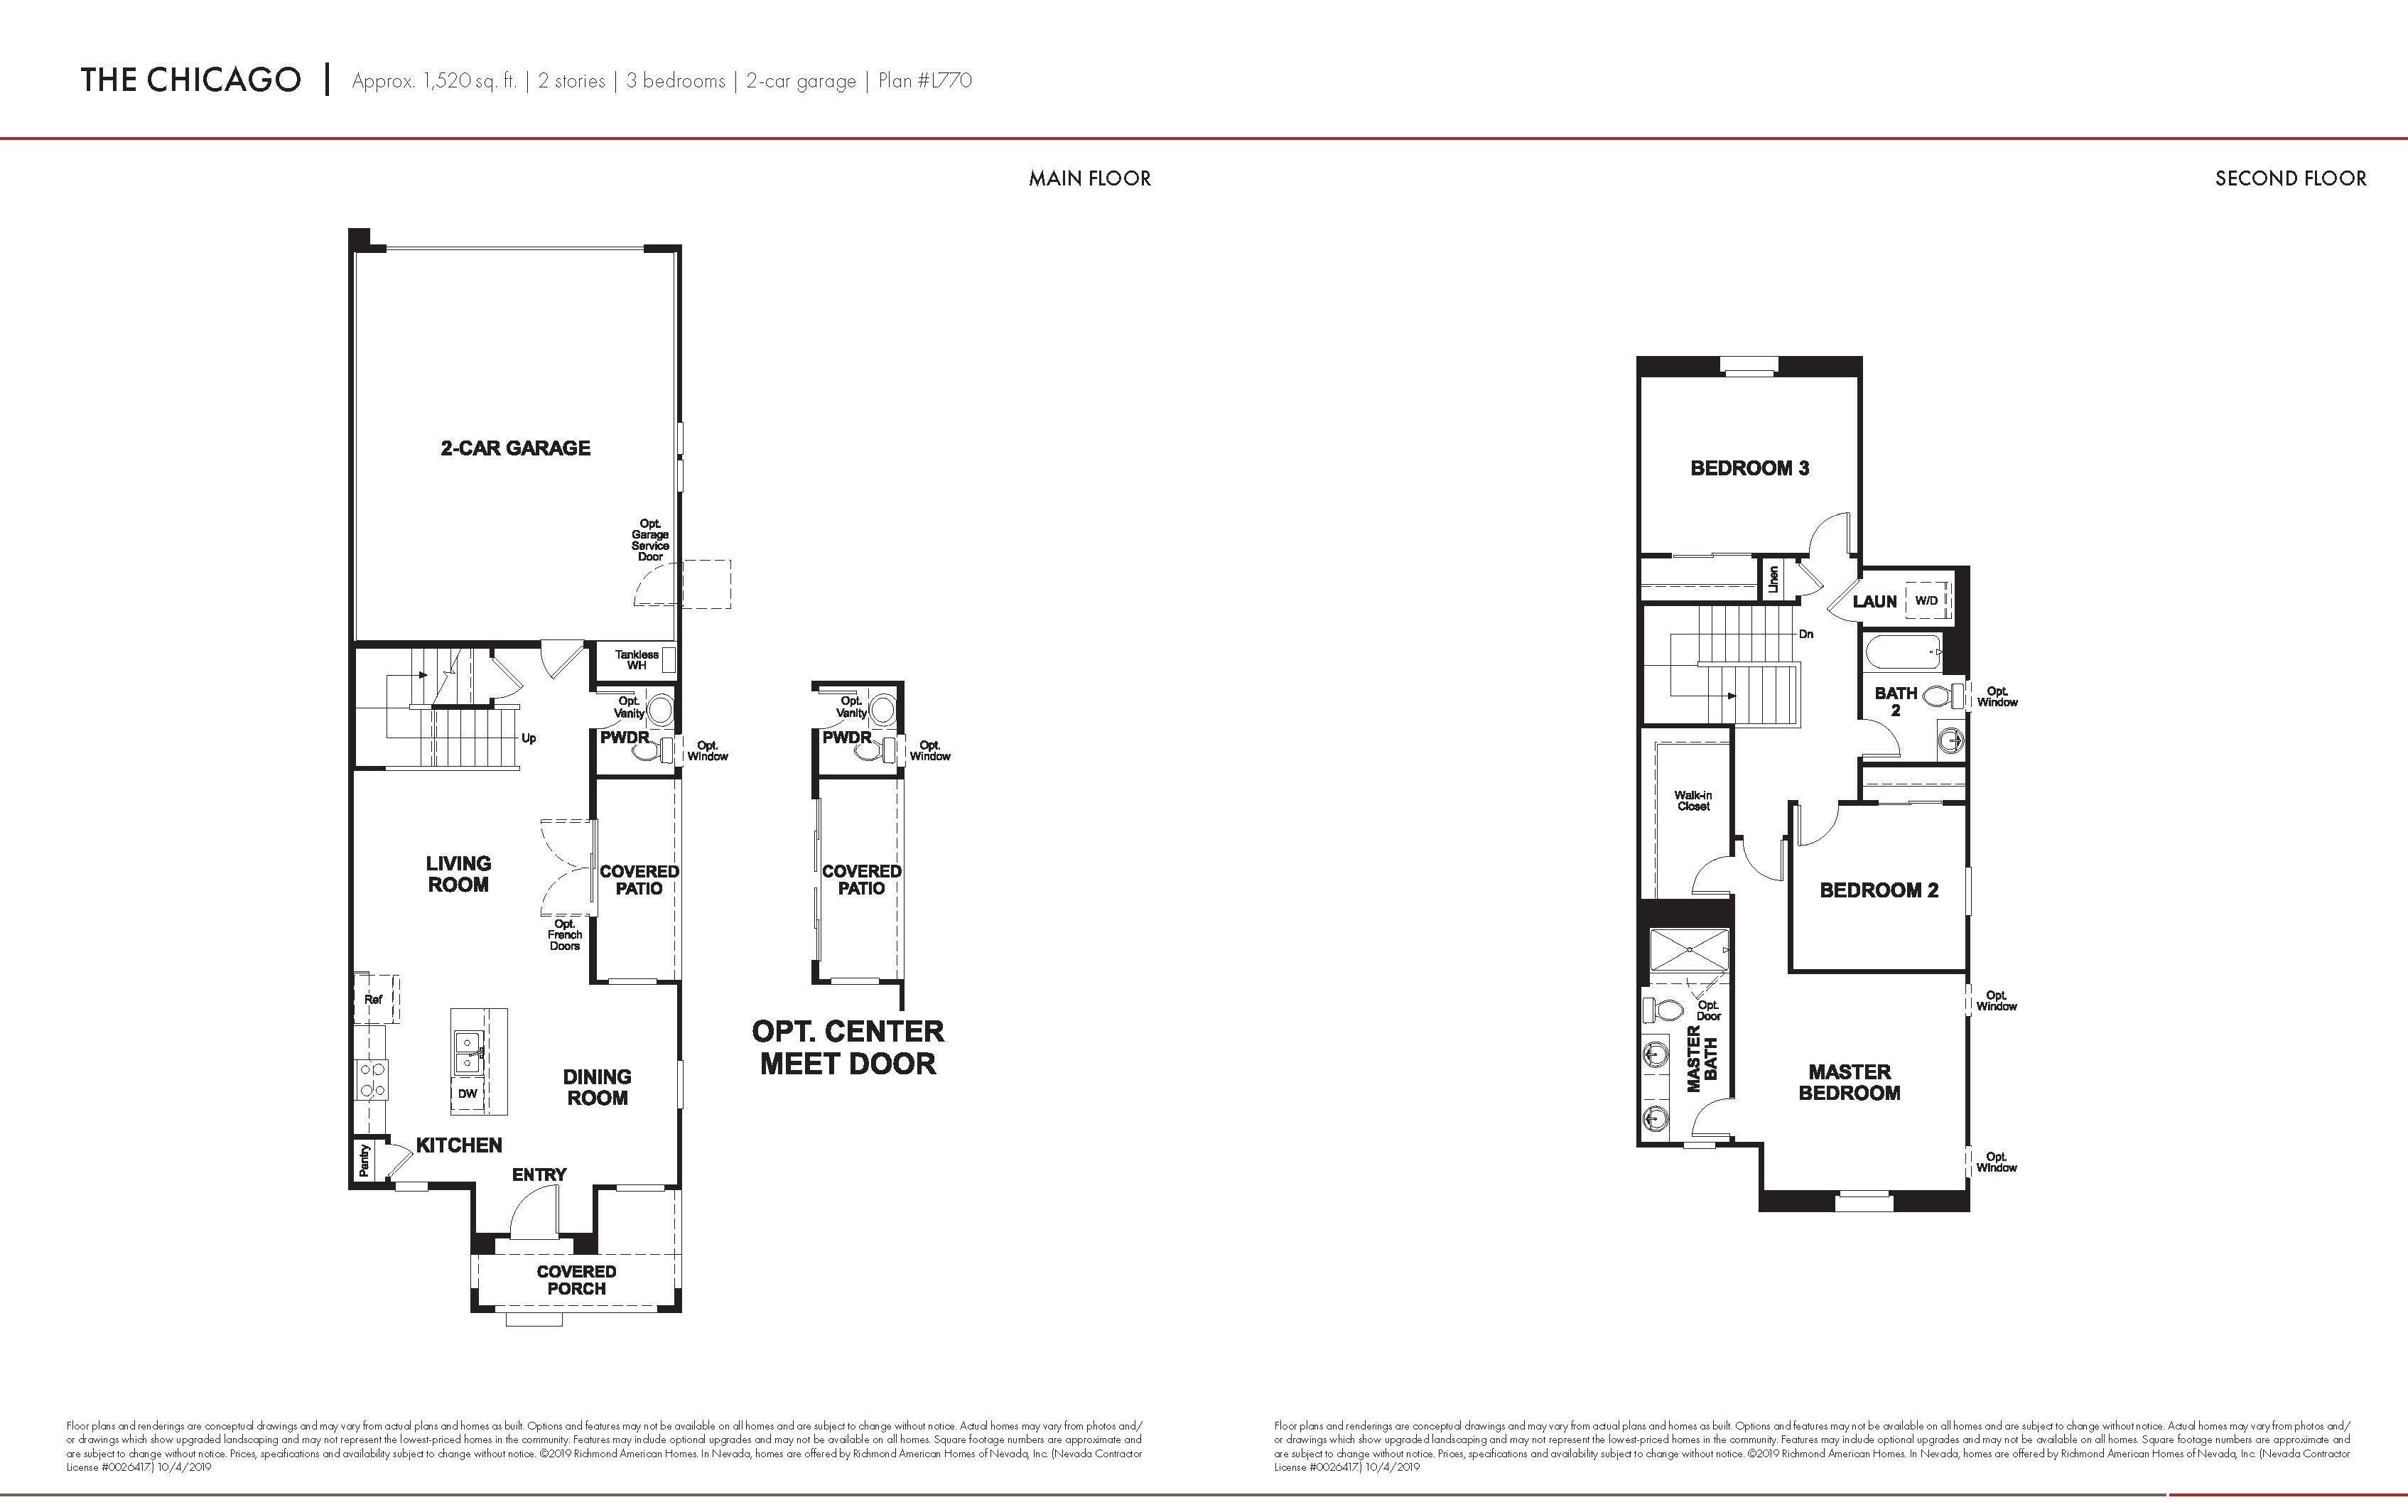 Floorplan for Chicago